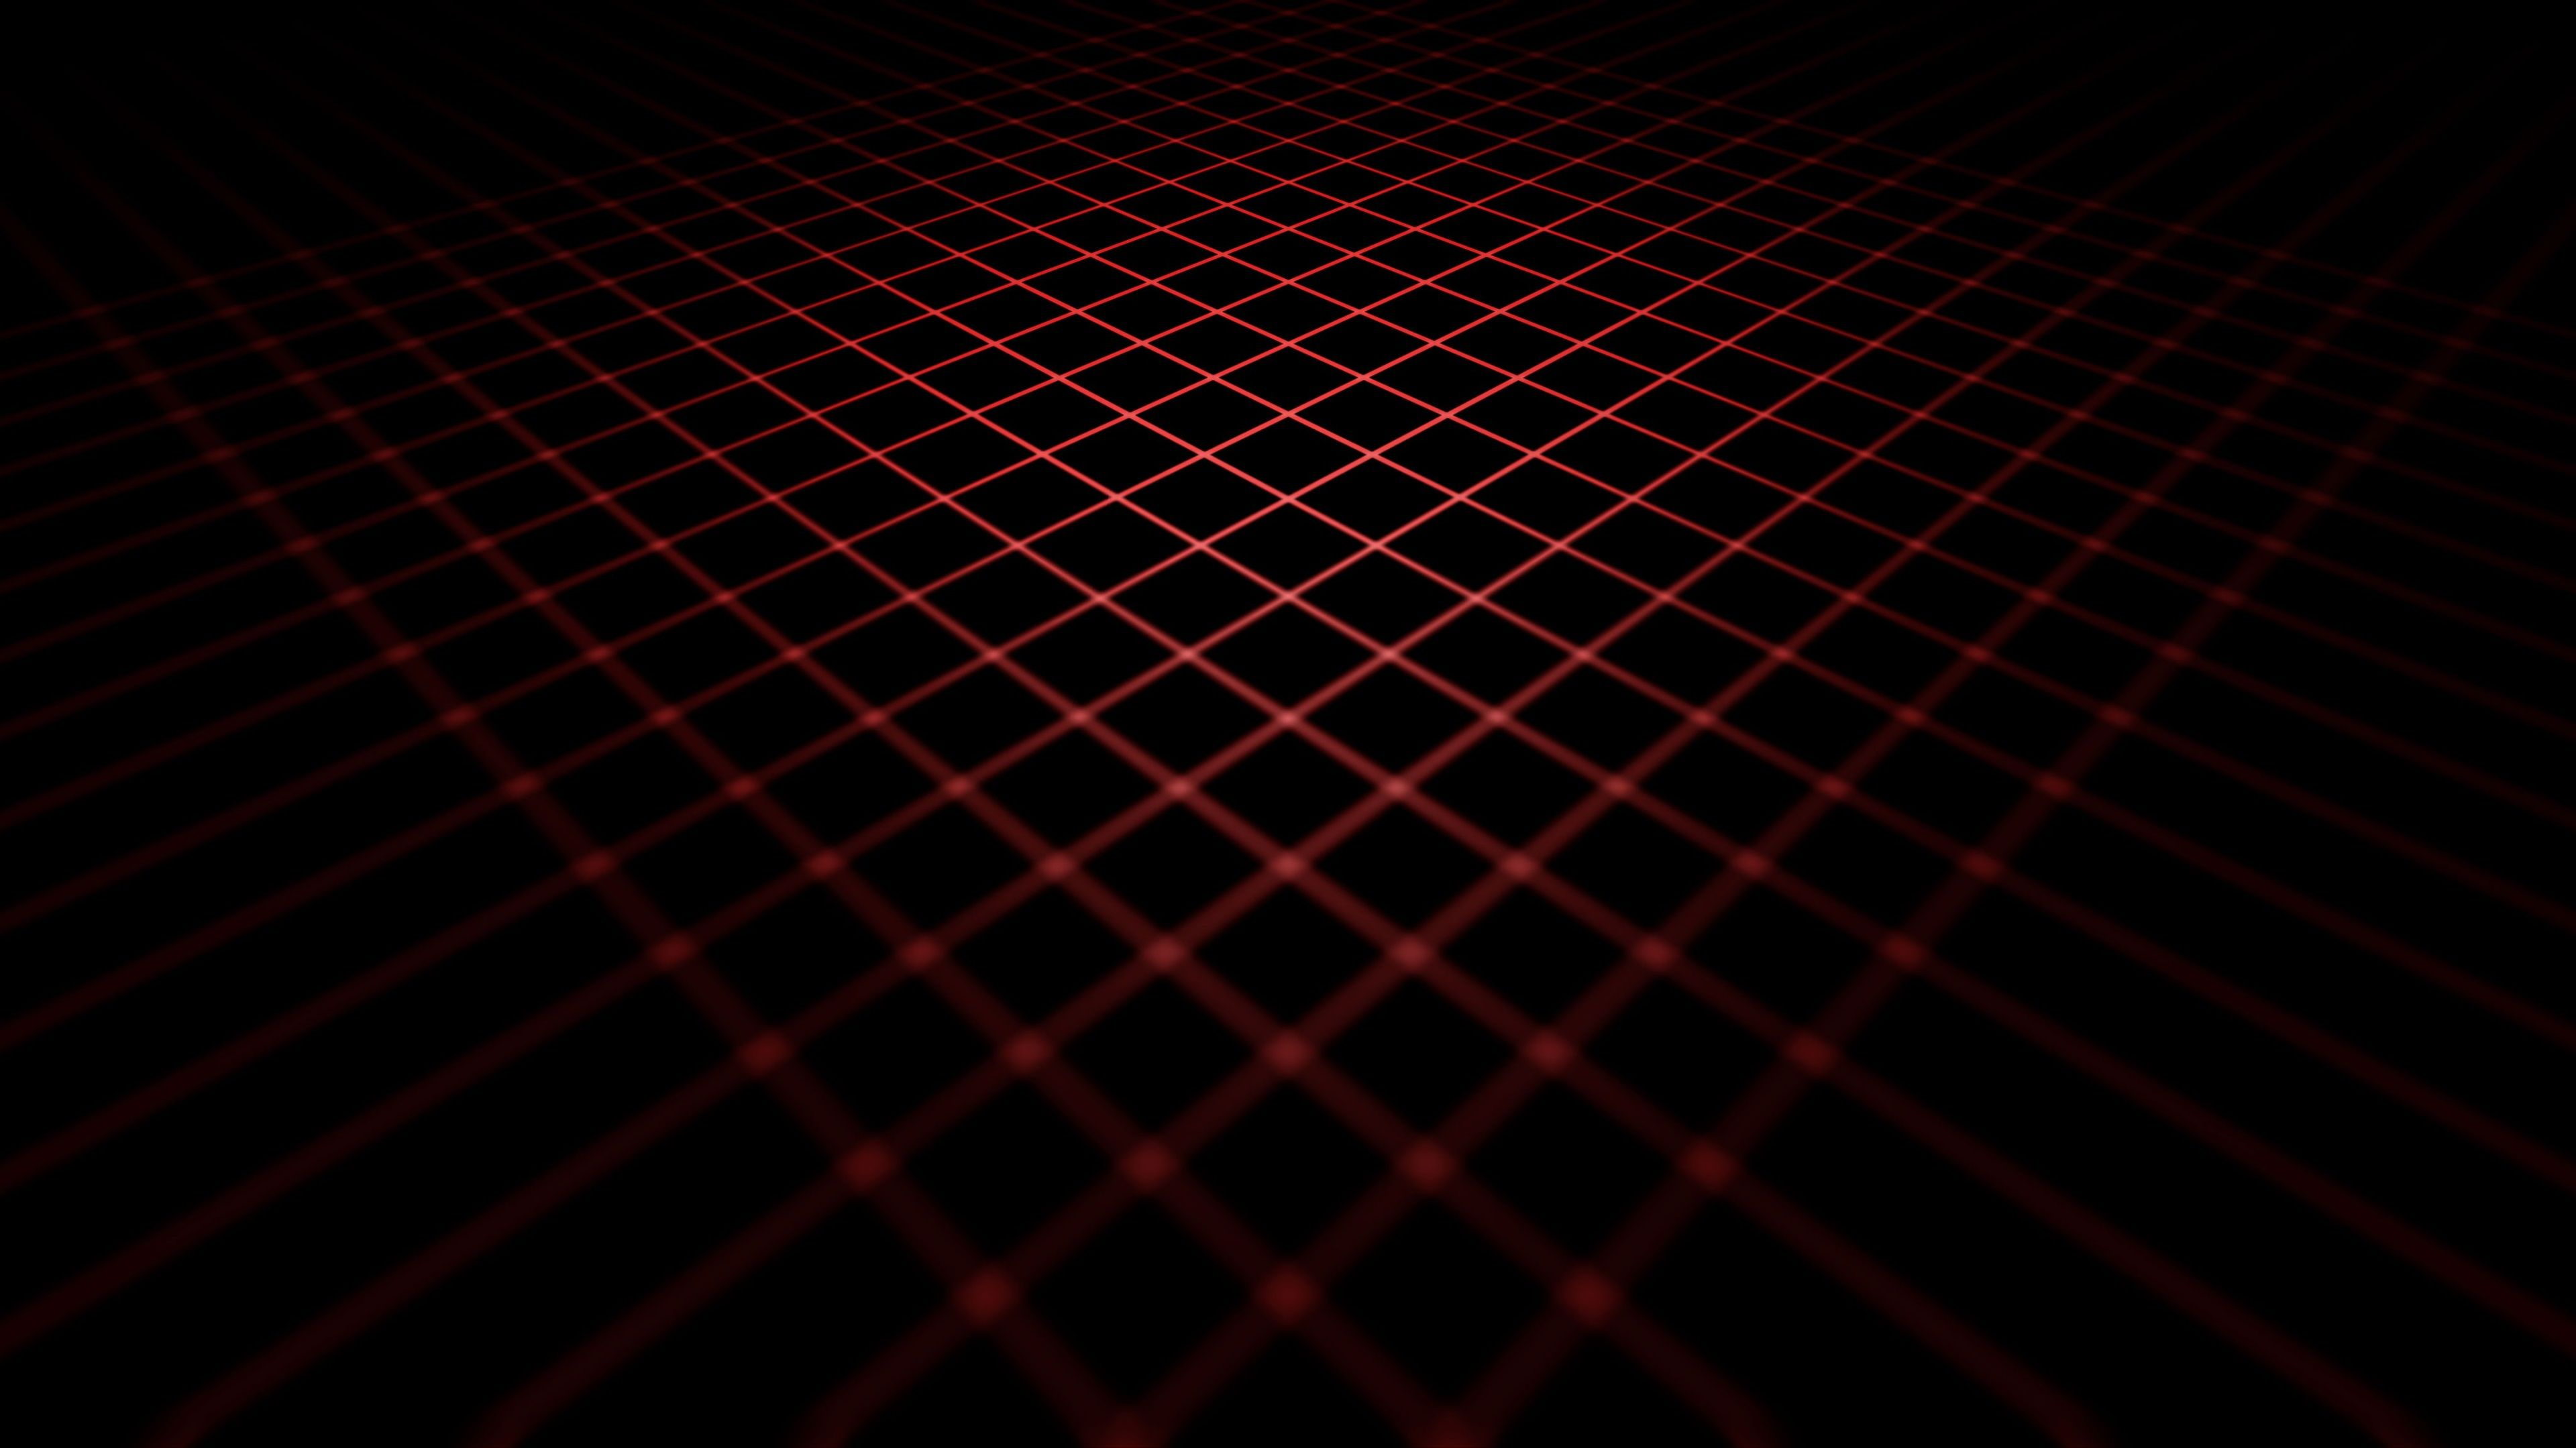 3840x2159 3d 4k Wallpaper Hd Full Screen Hd Wallpaper Pattern Abstract Lines Hd Wallpaper